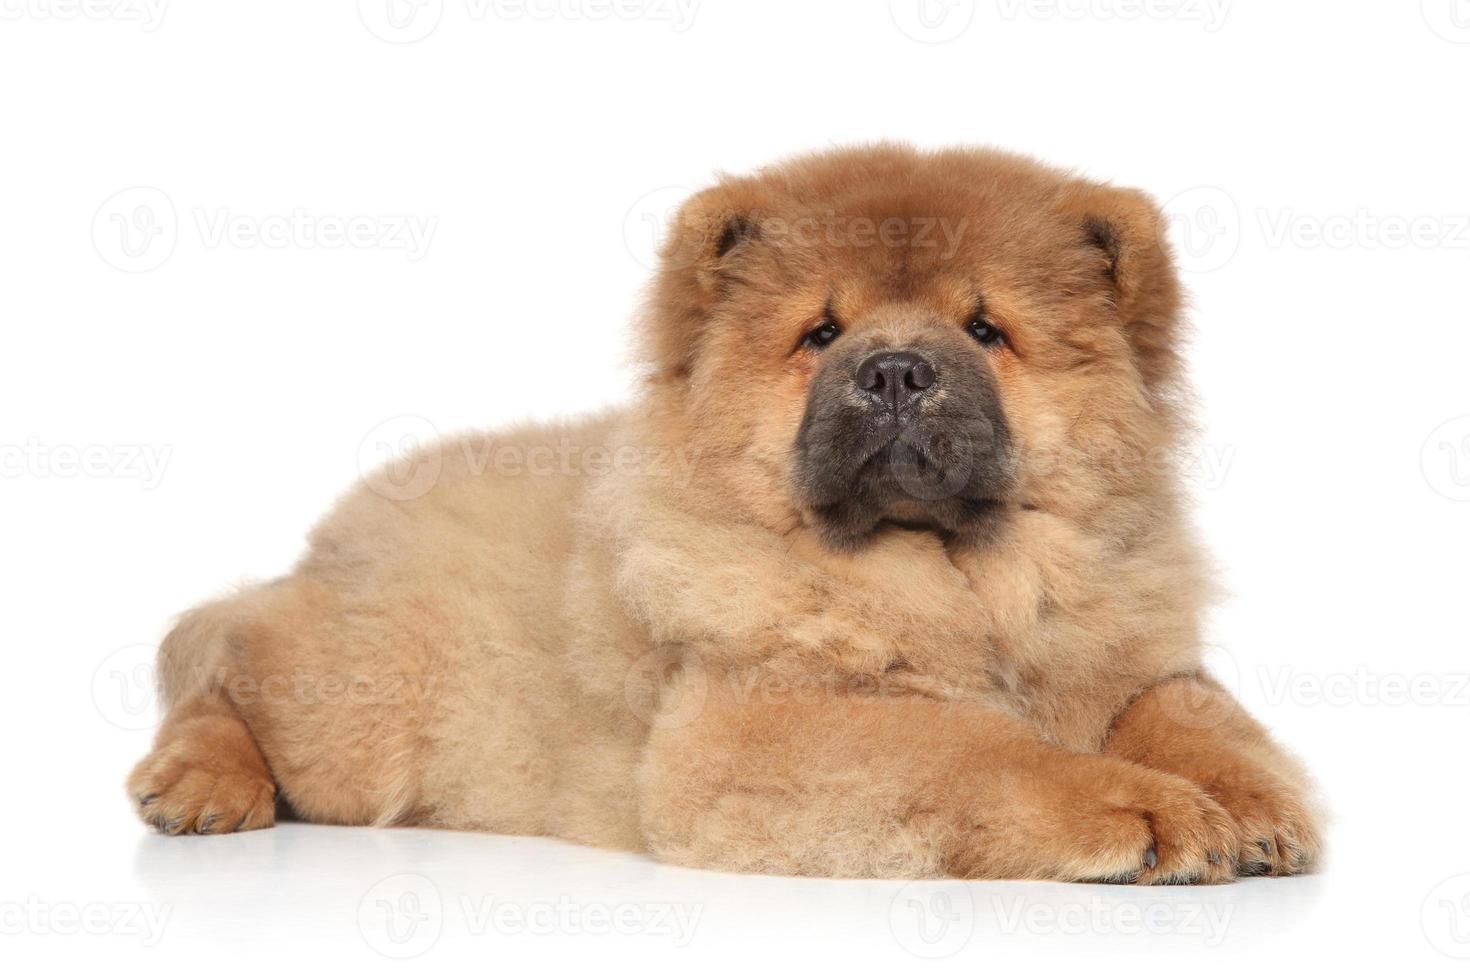 chow-chow puppy liggend op een witte achtergrond foto